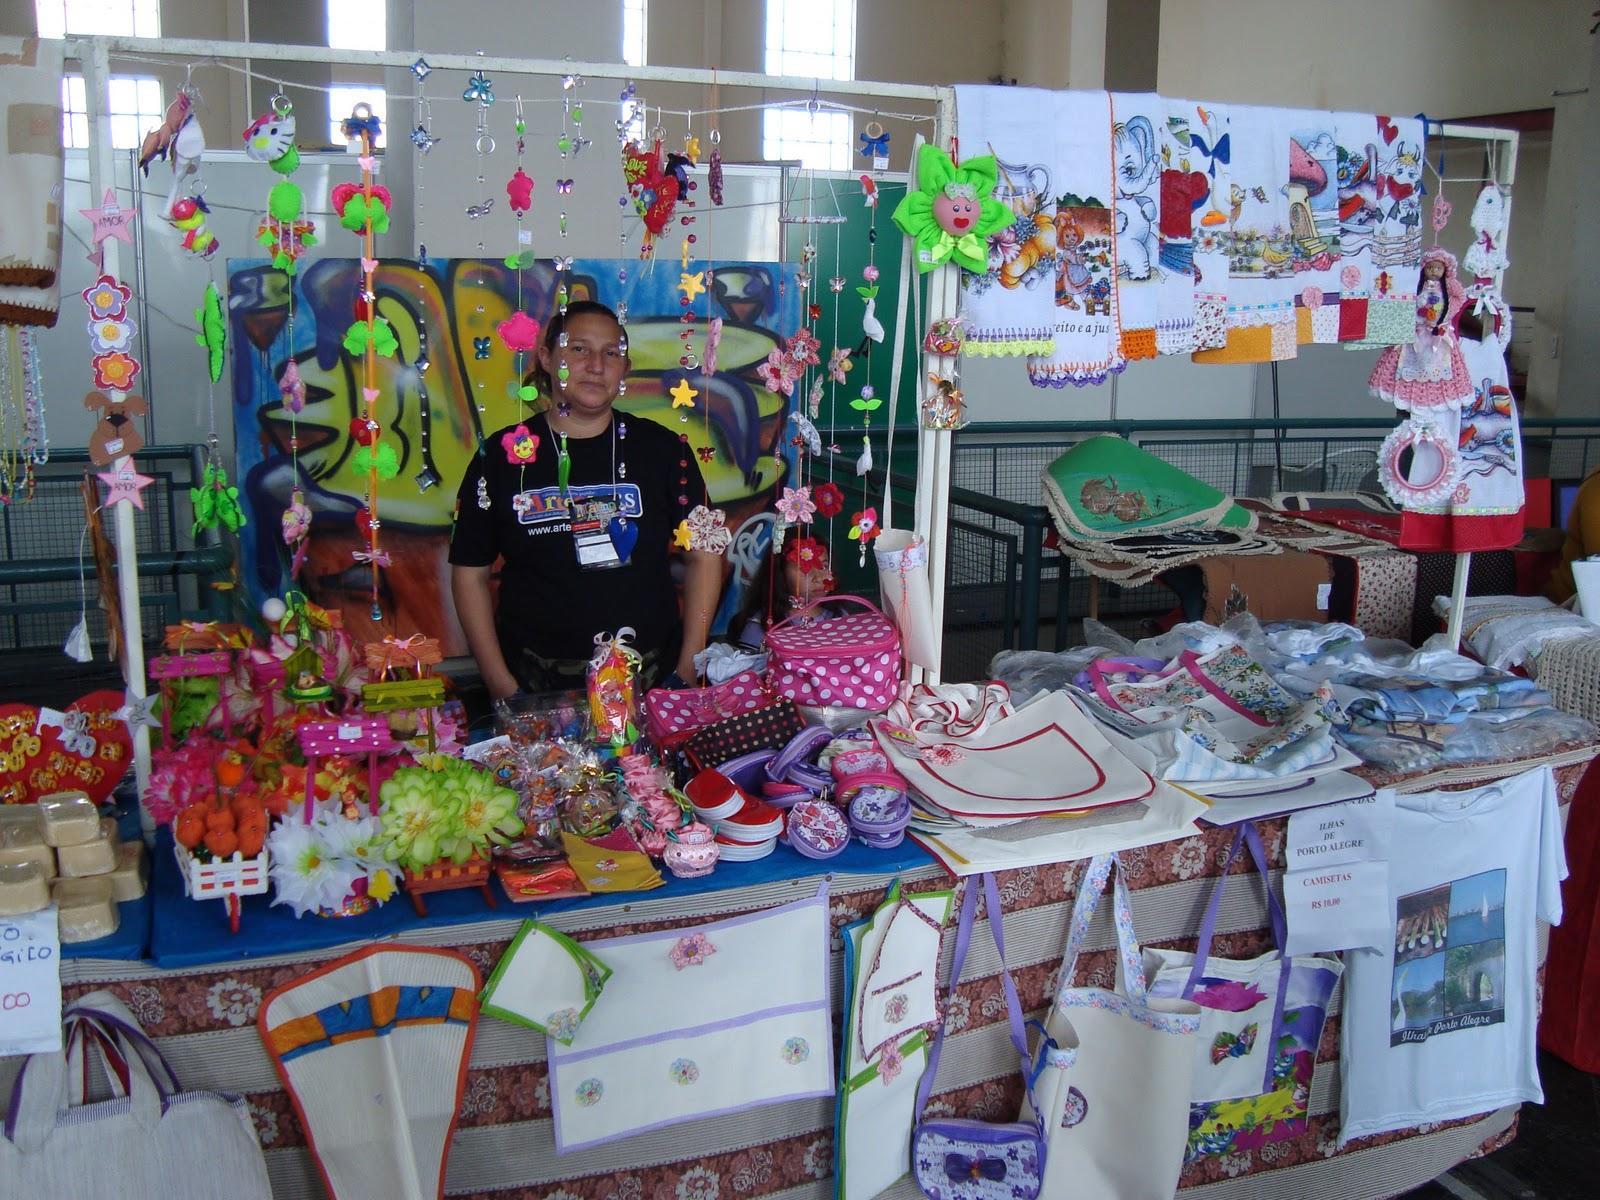 Artesanato Garrafa Pet ~ Ilha das Flores busca Sustentabilidade 21 u00b0 Feira Latino Americana de Artesanato